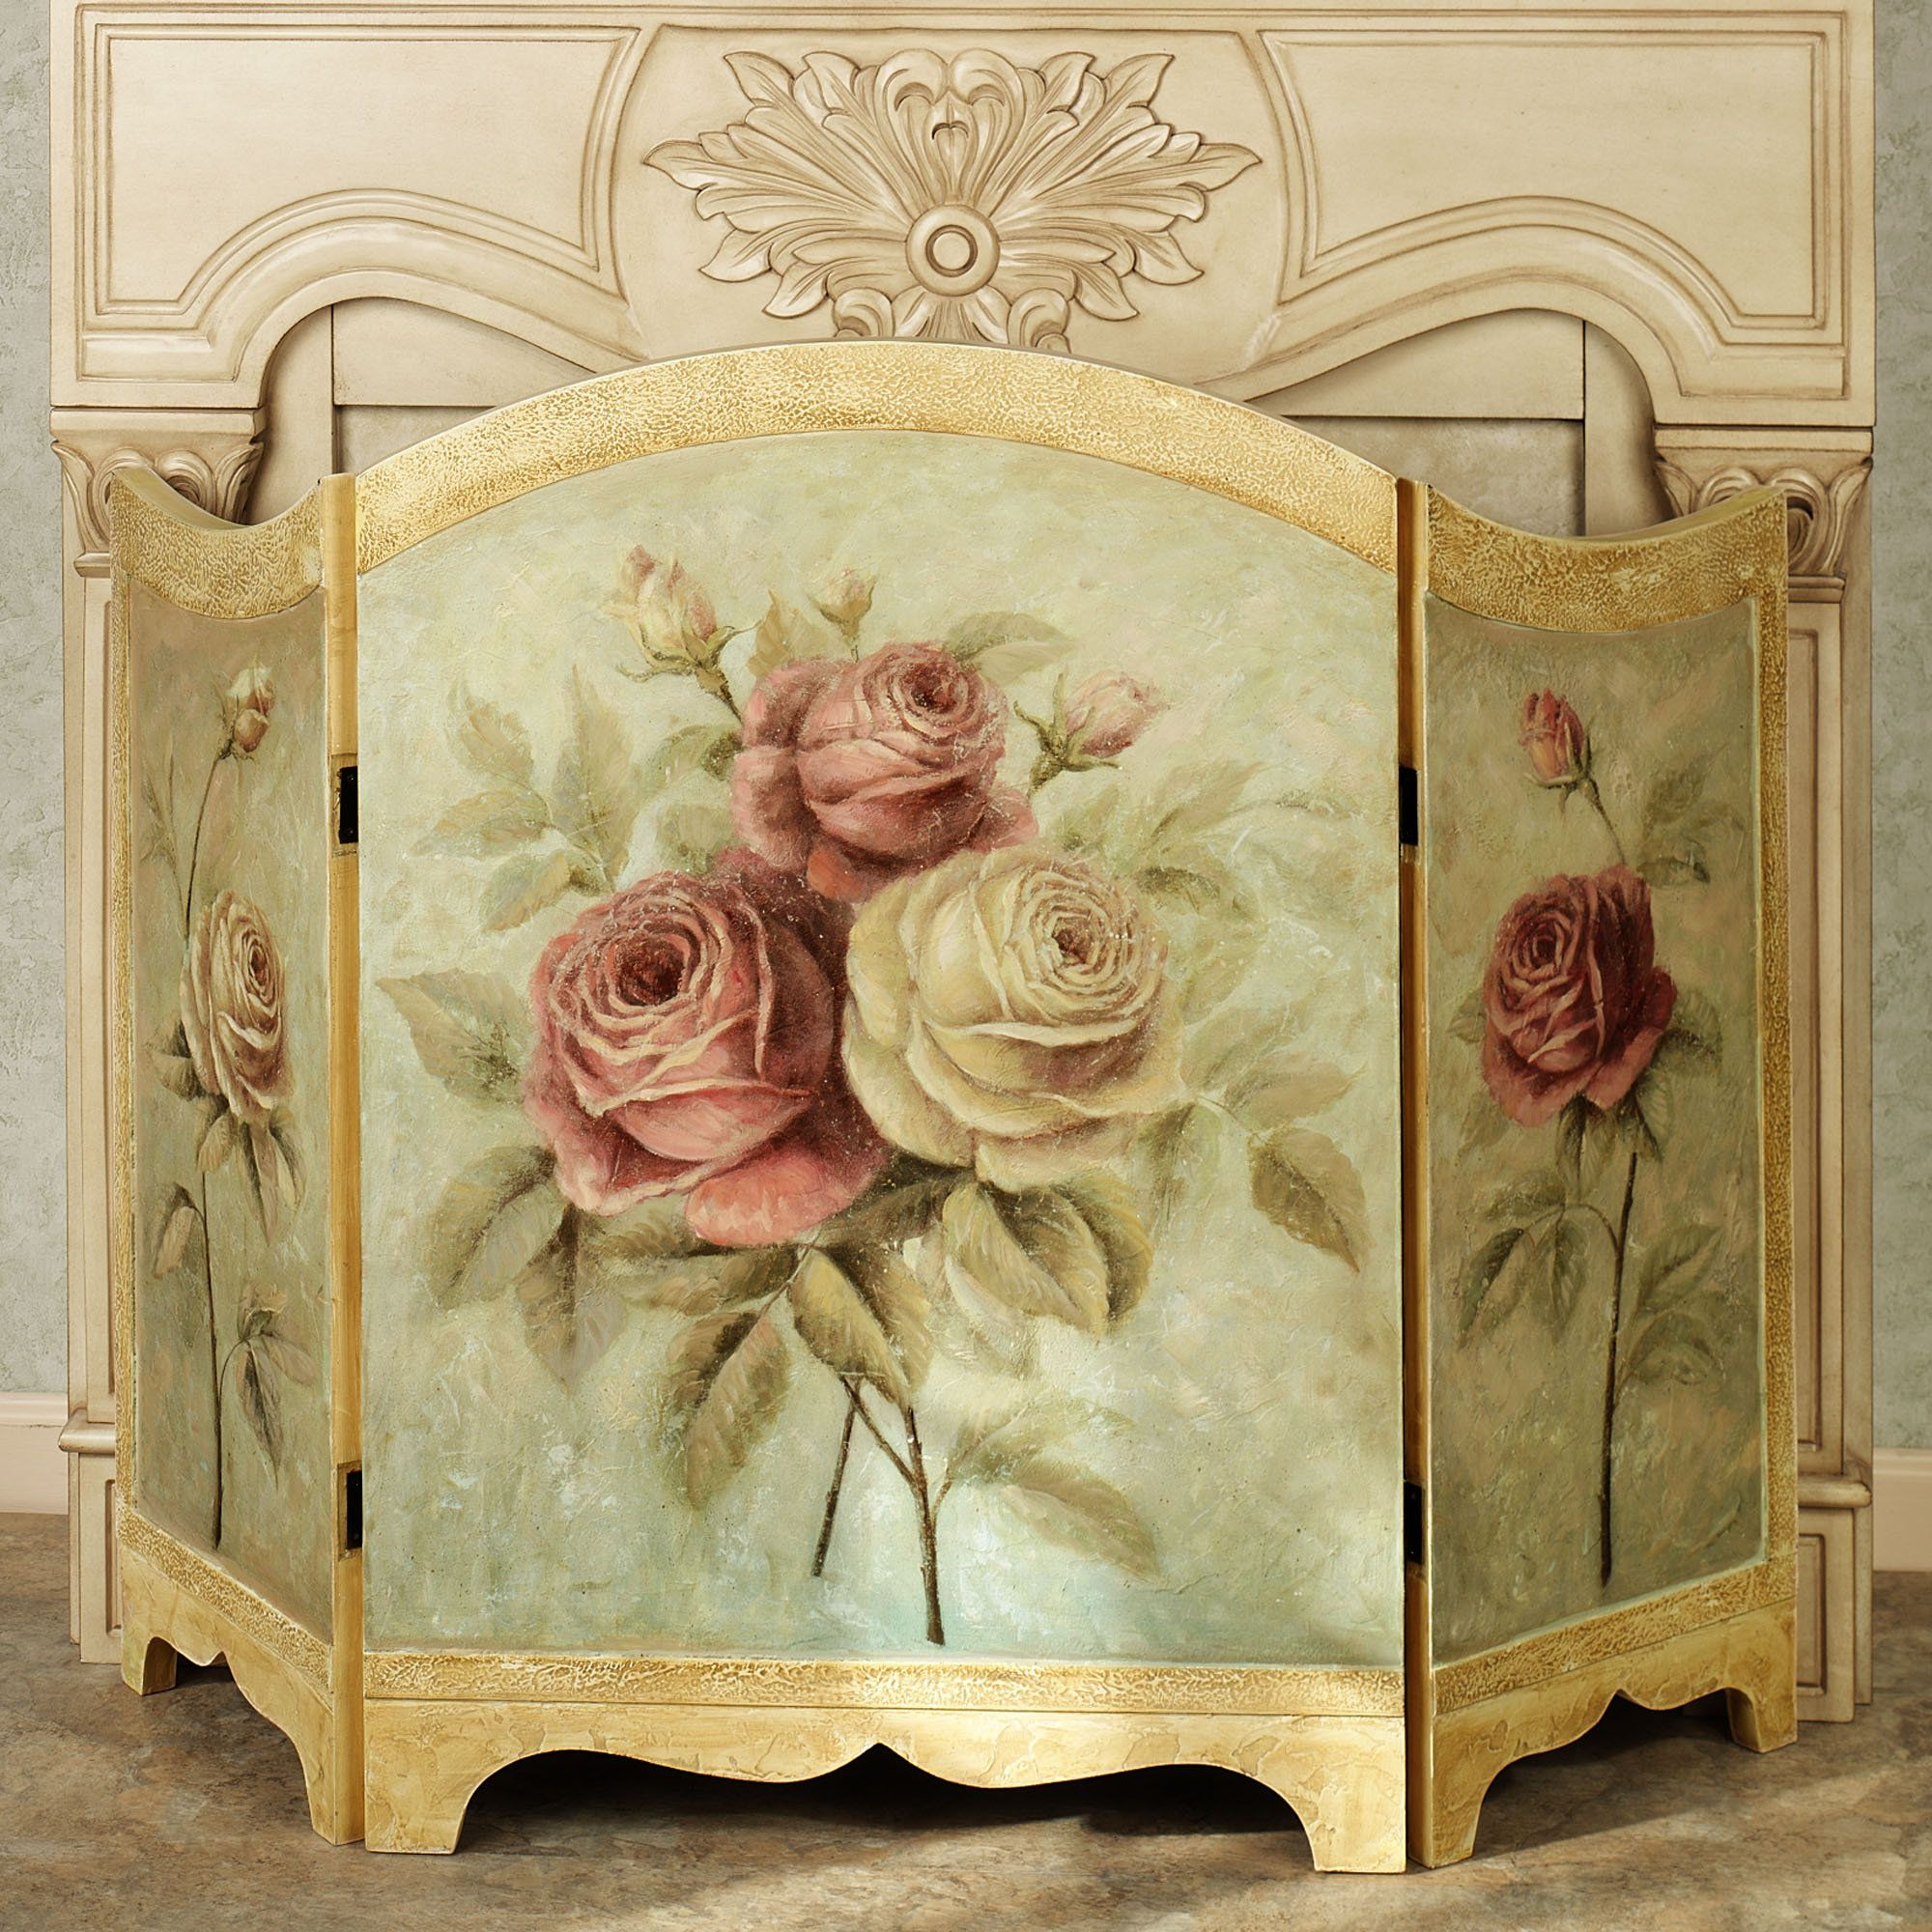 Rose delight decorative fireplace screen fireplace screens rose delight decorative fireplace screen teraionfo